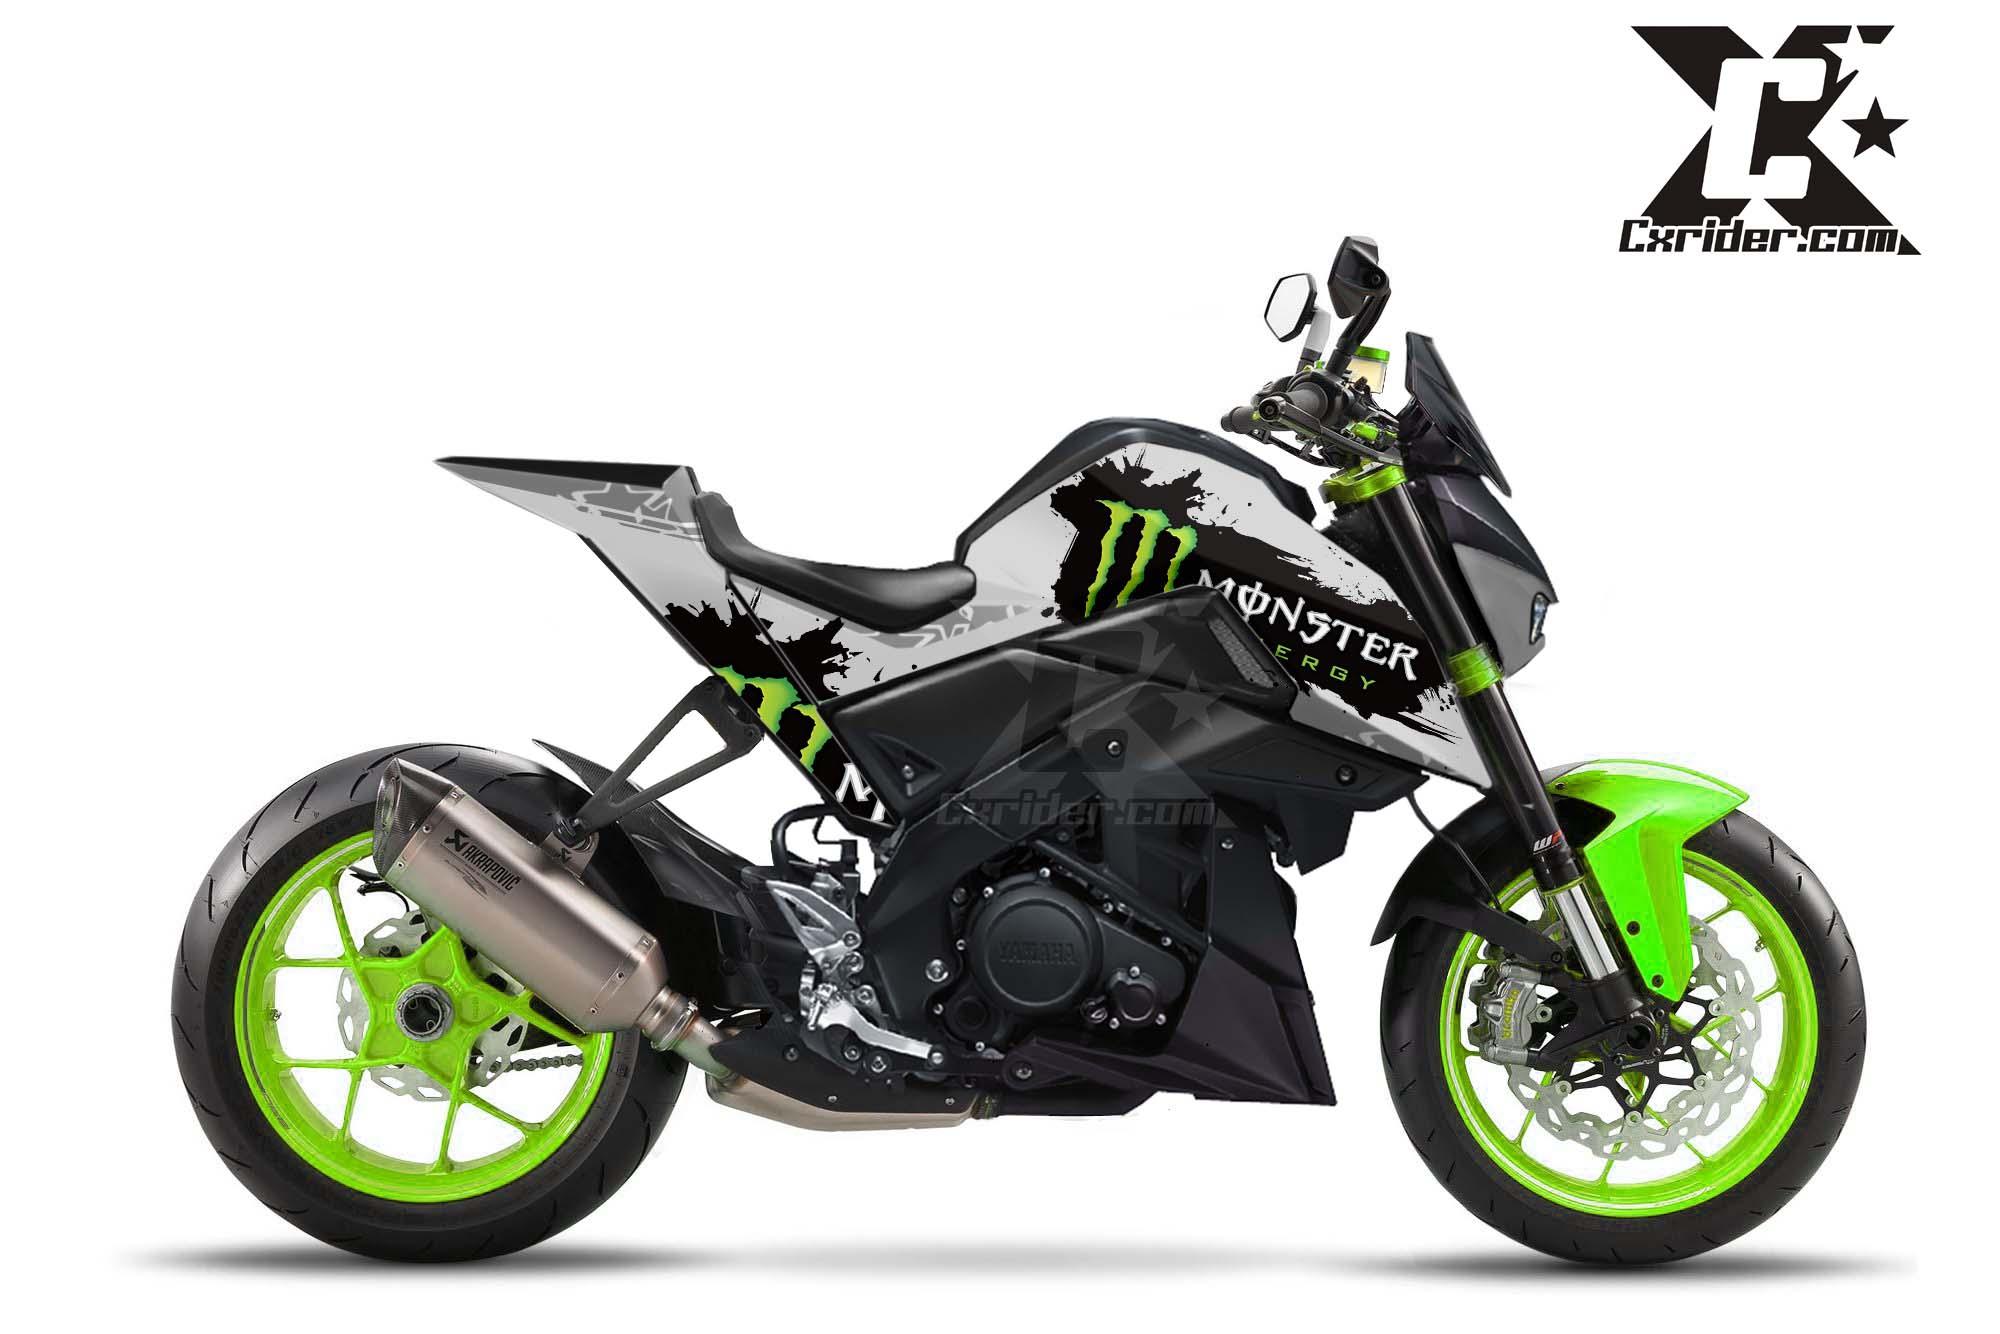 Yamaha MT 15 Facebook: Konsep Modifikasi Yamaha MT 15 M-Slaz Monster